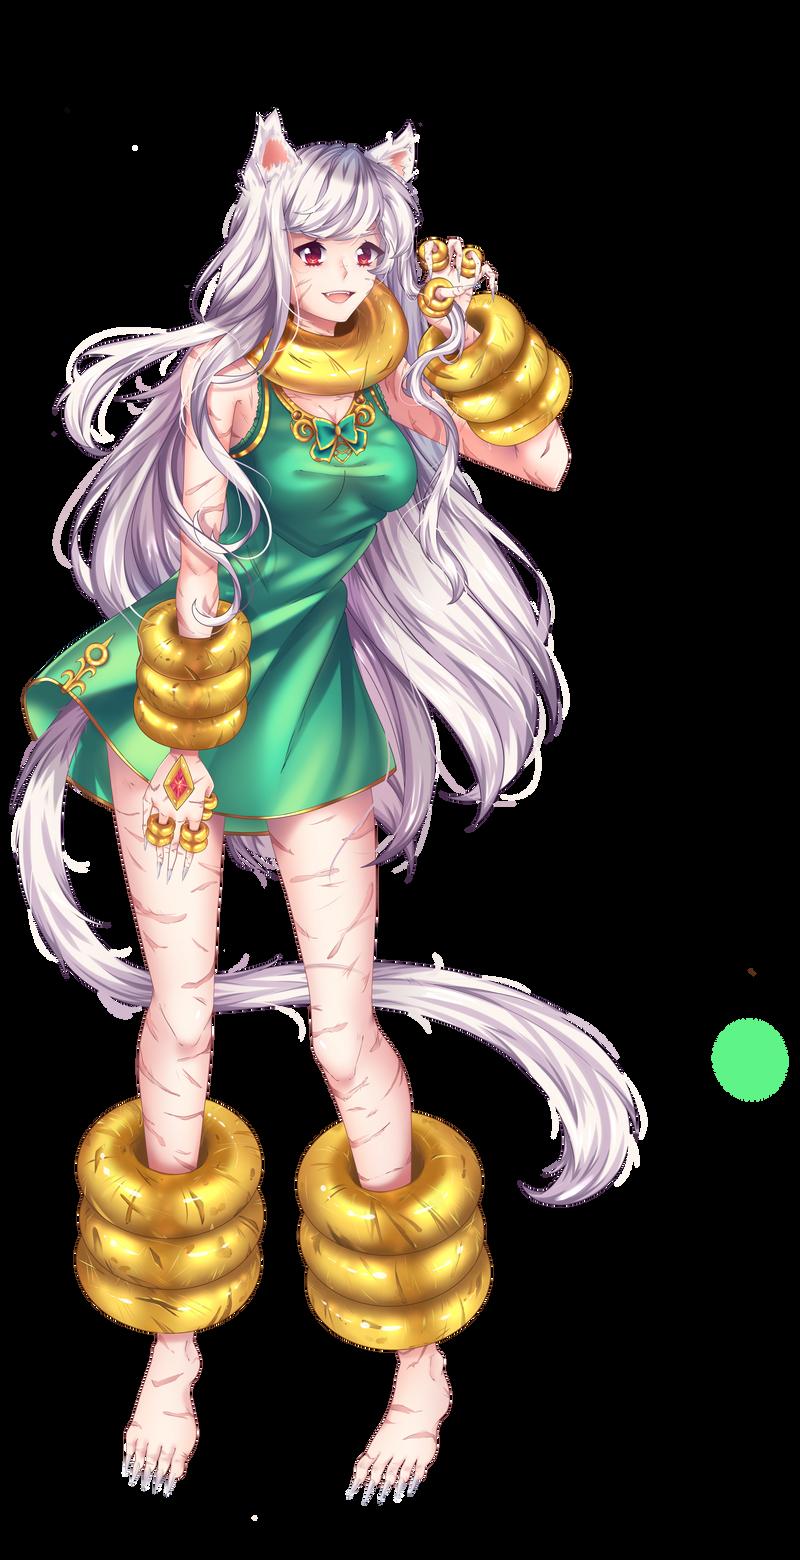 Feline [Commission] by Mimyoi